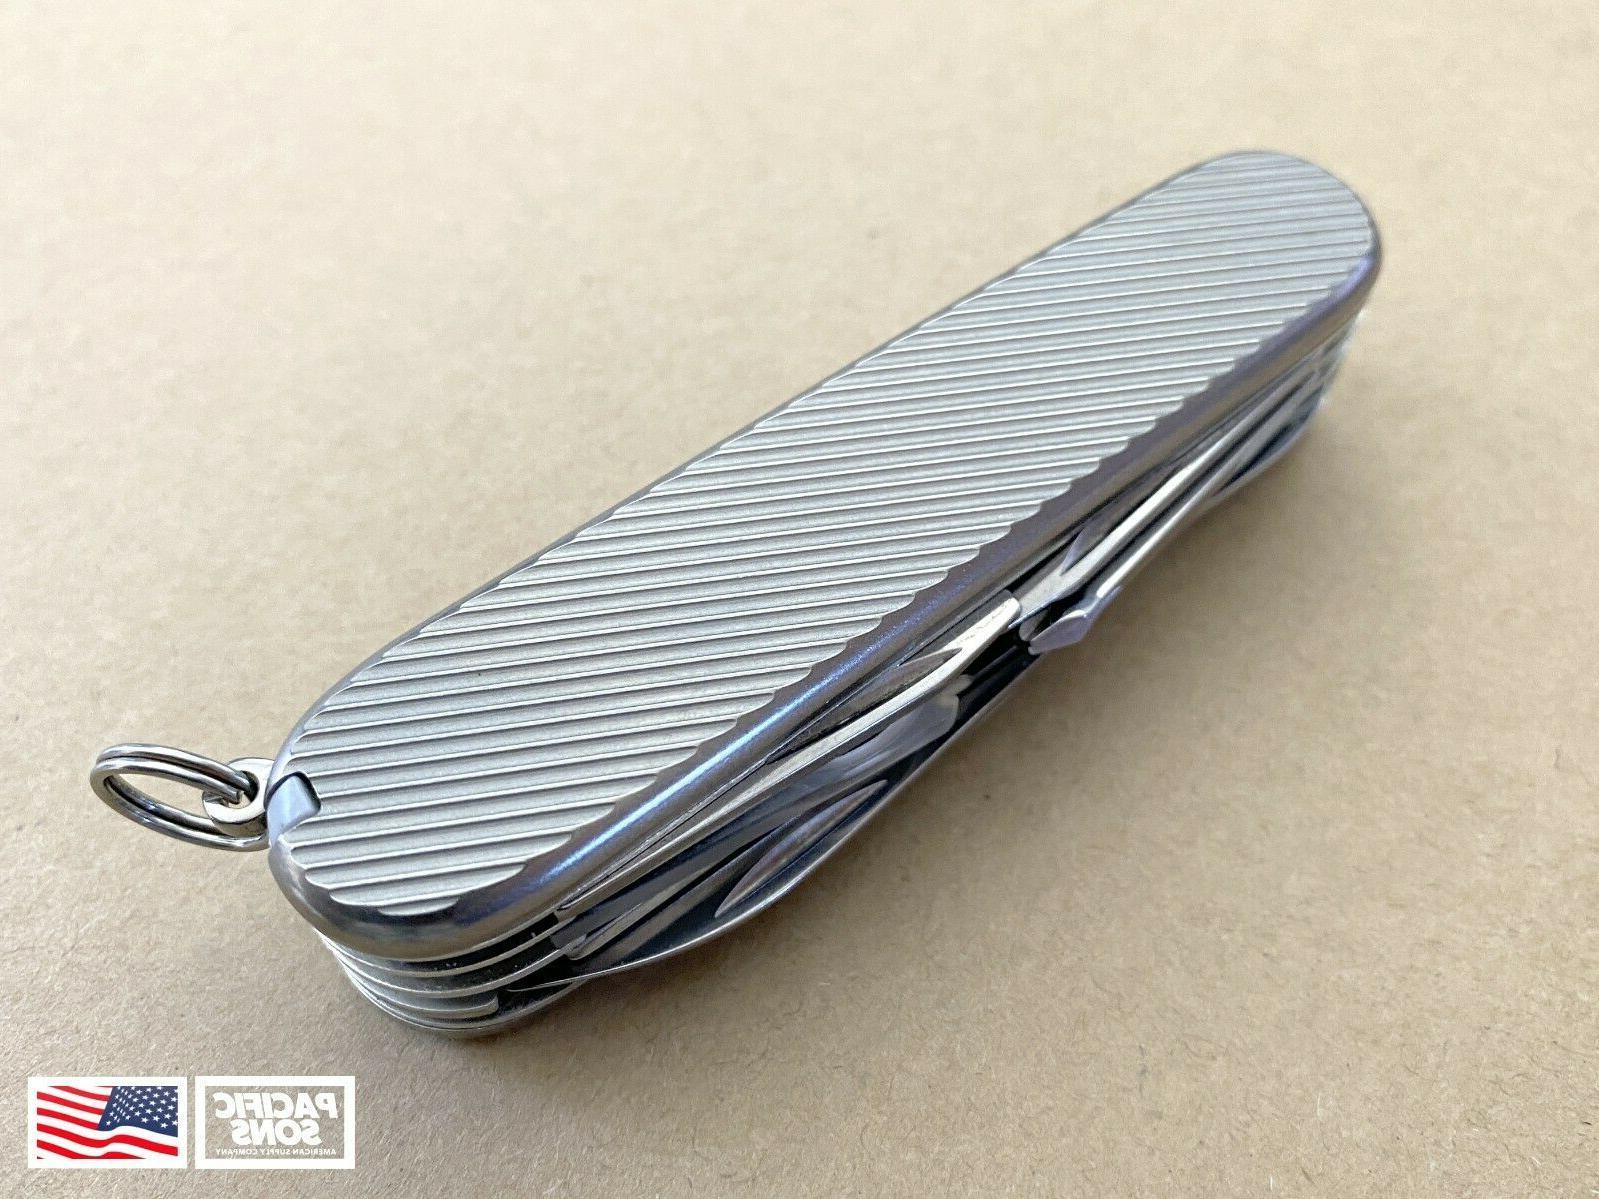 91mm titanium swiss army knife scales line